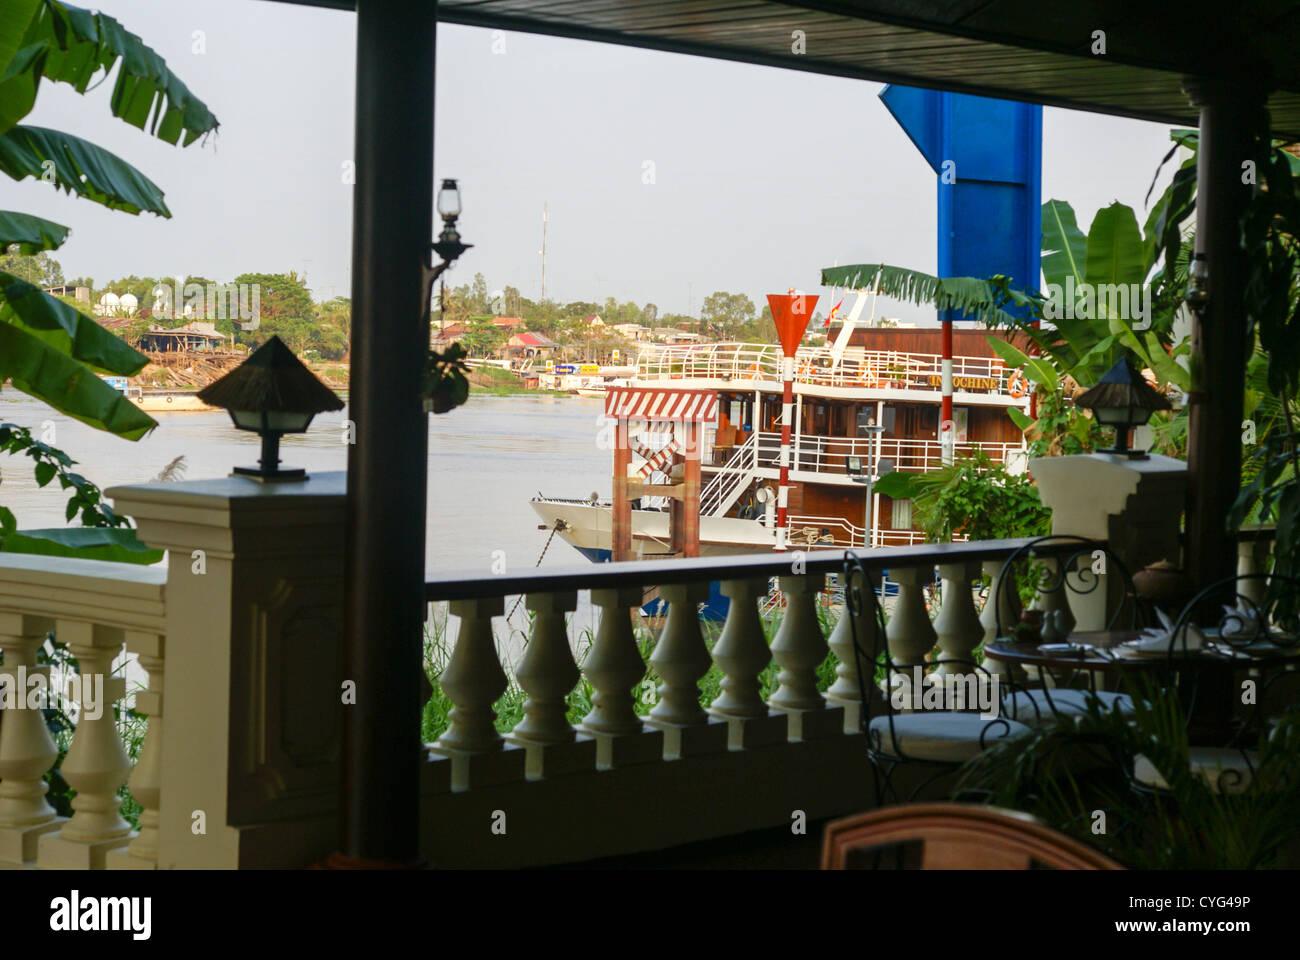 Vietnam, Chau Doc, Mekong River Delta - Stock Image